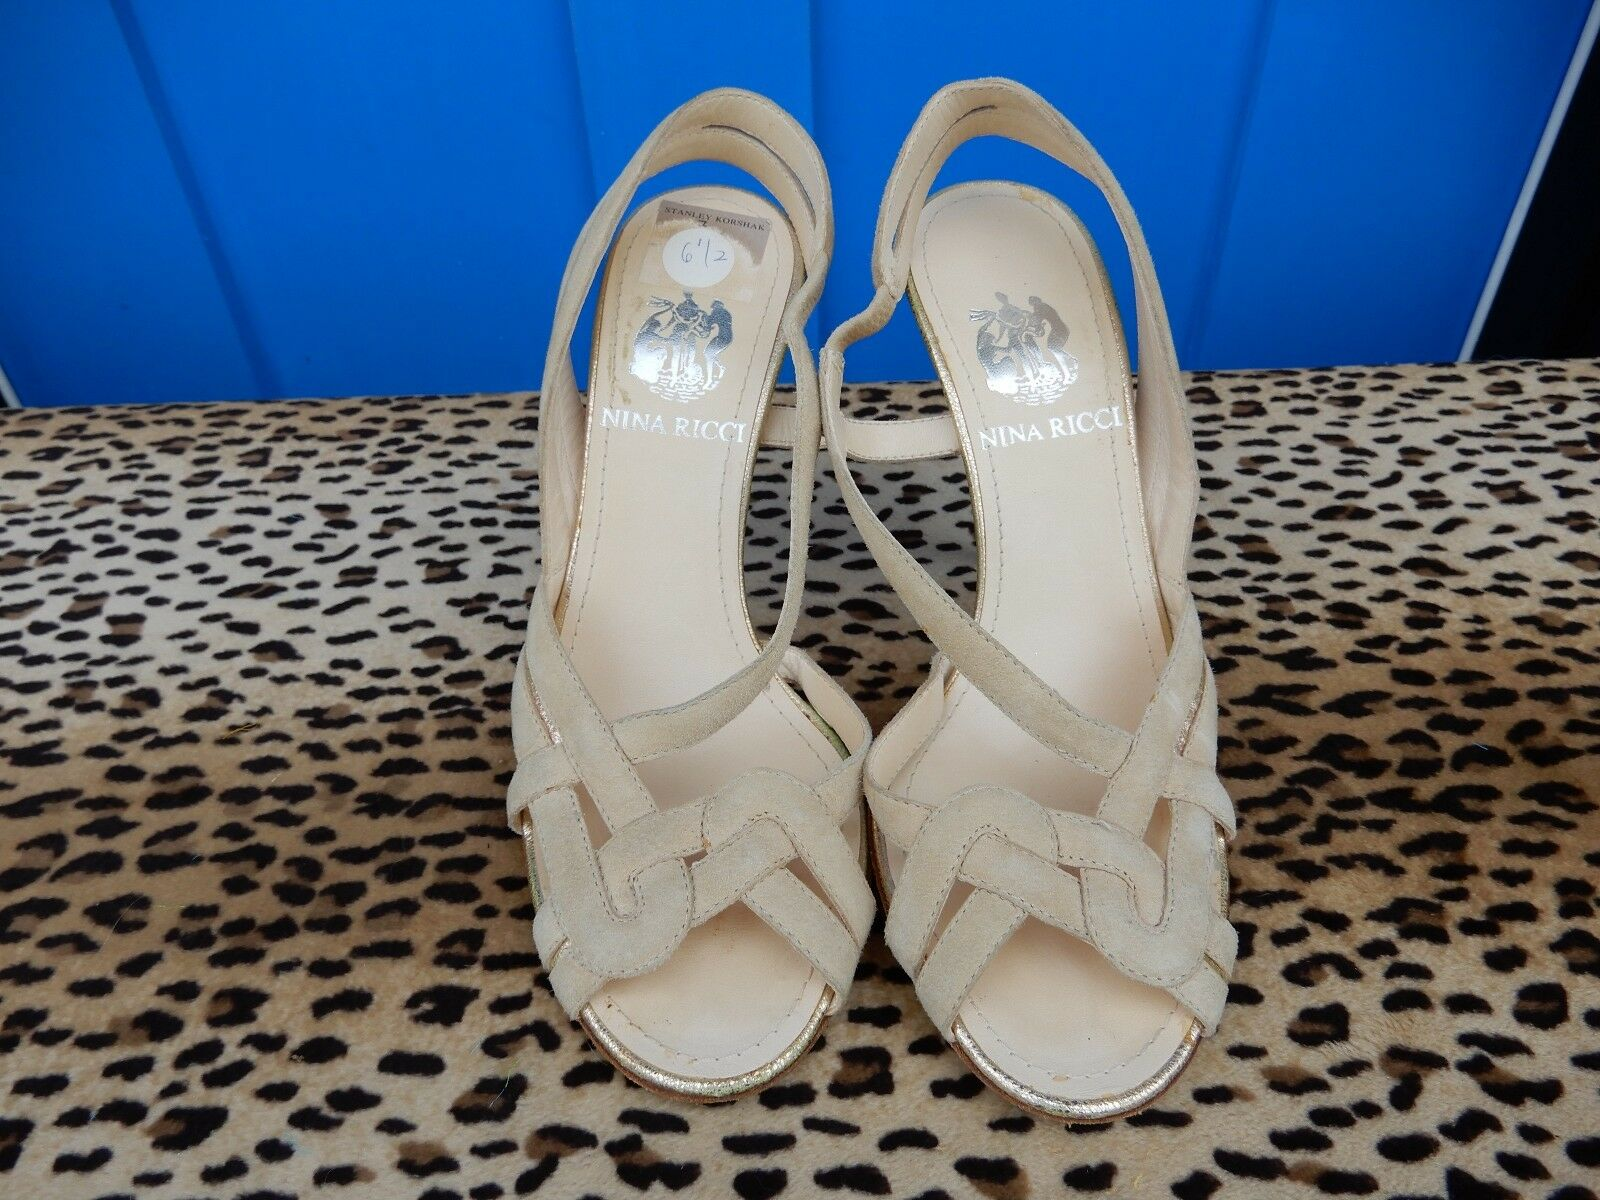 Nina Ricci Talla 37 7 Beige Gamuza Con Con Con Tiras Charol Tacones 4  sandalias de oro acento  descuento de ventas